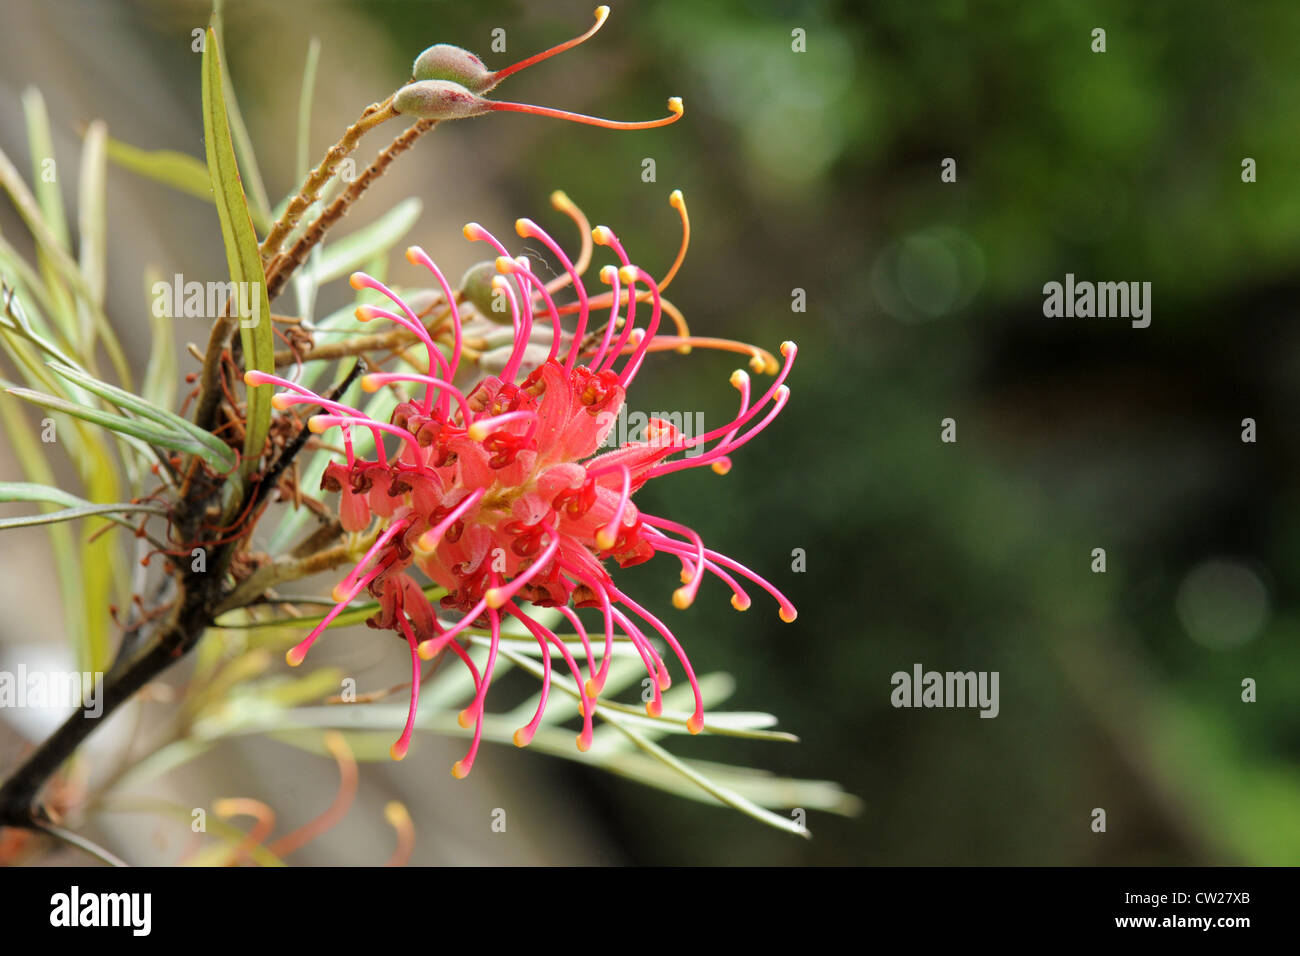 Olive Grevillea or Grevillea olivacea in a botanic parc inAustralia - Stock Image